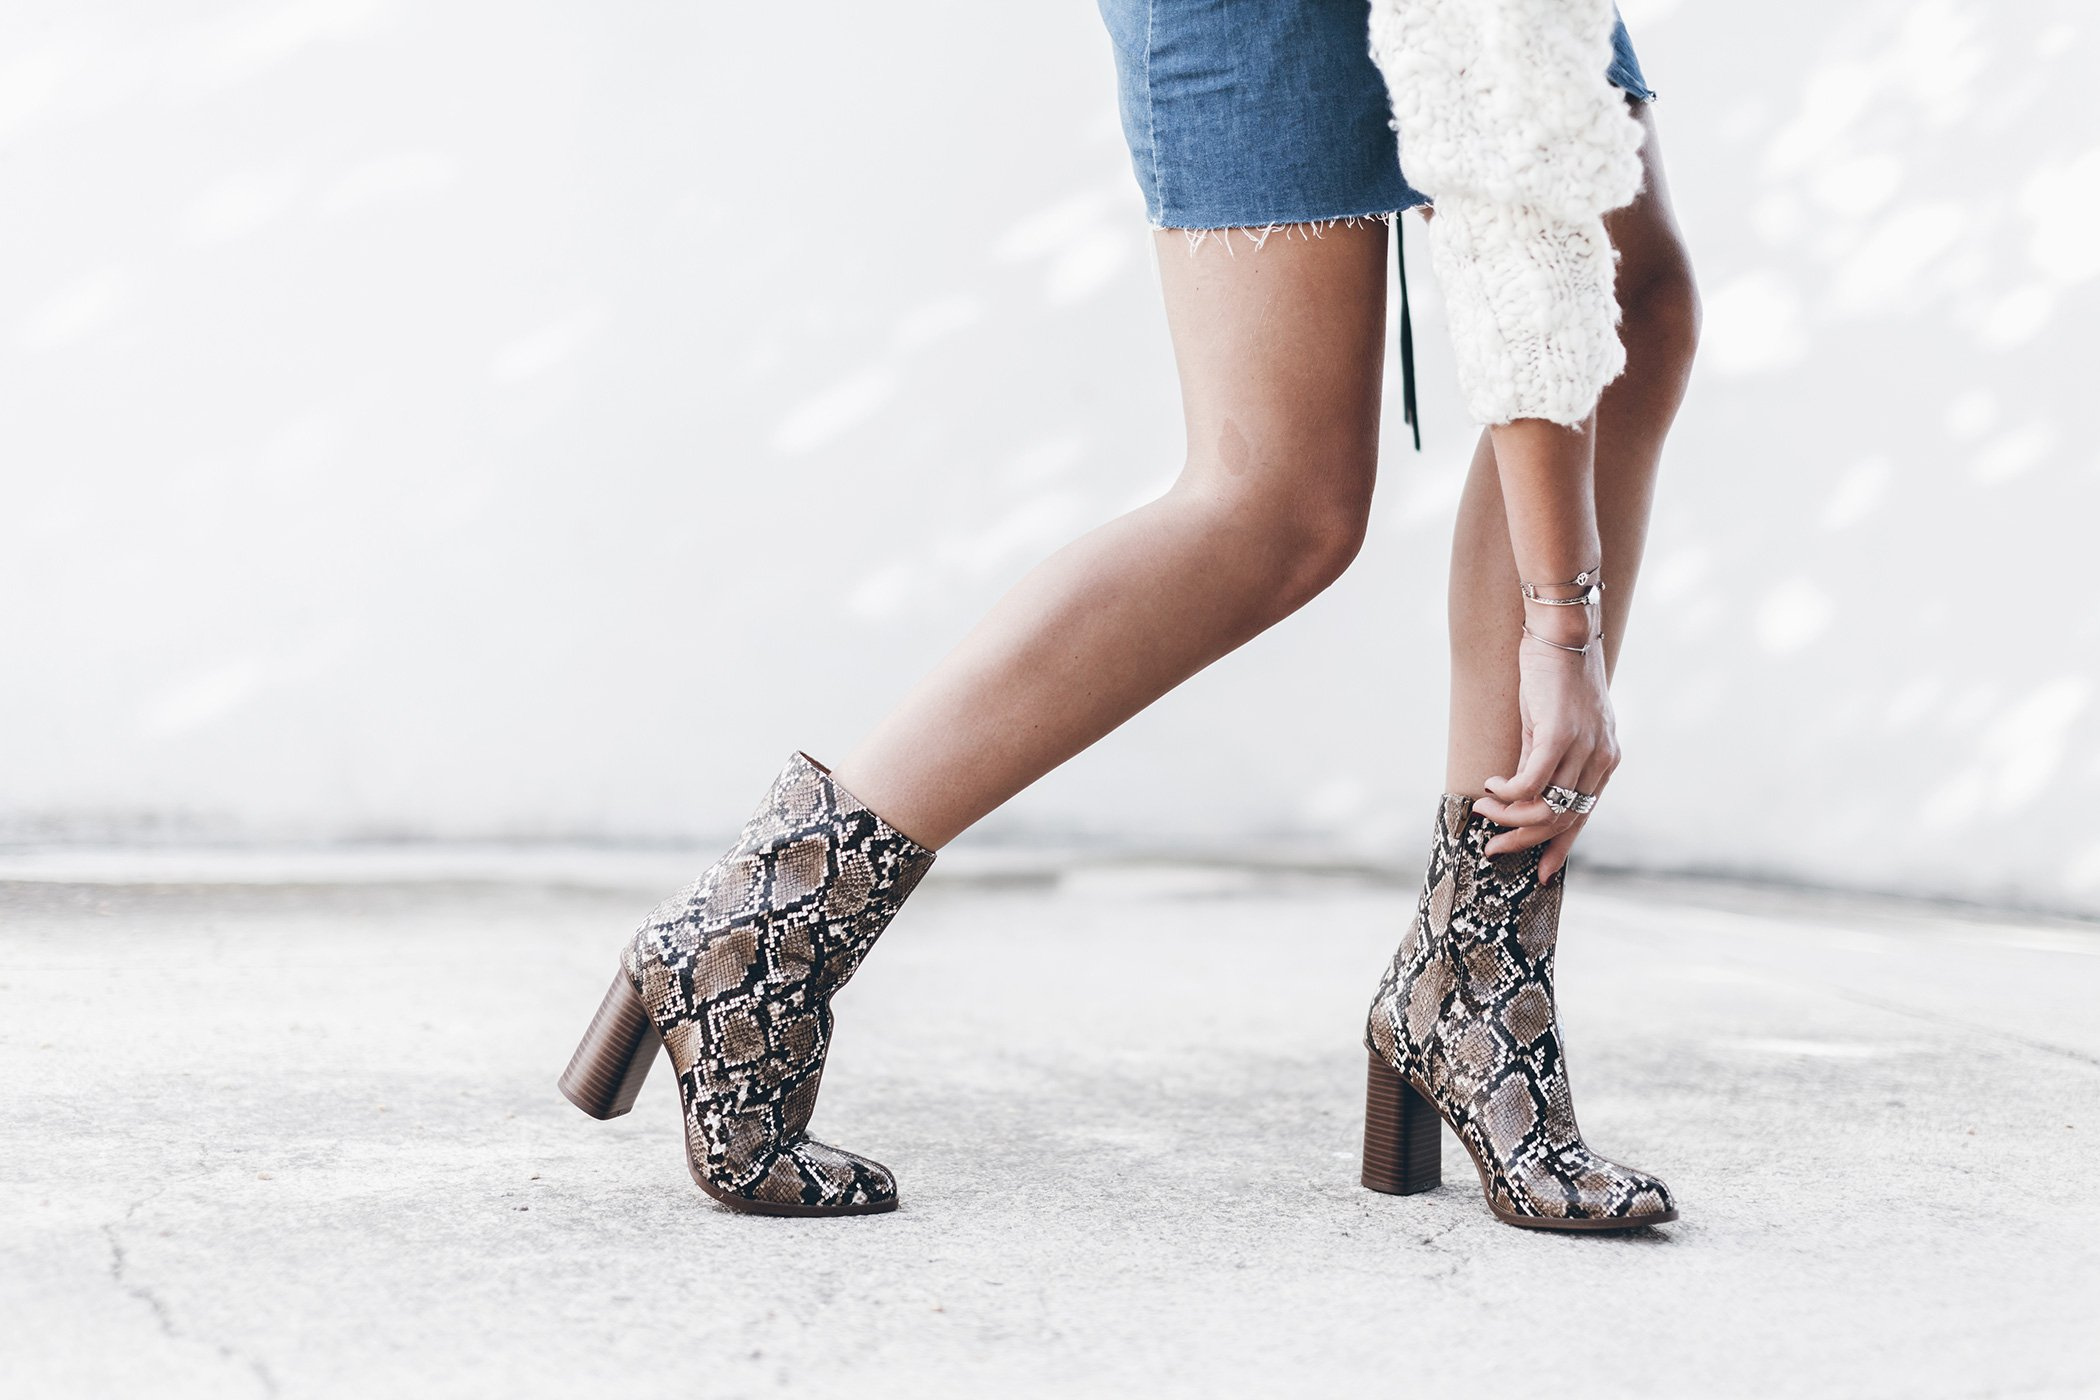 mikuta-snake-boots-and-denim-skirt-2